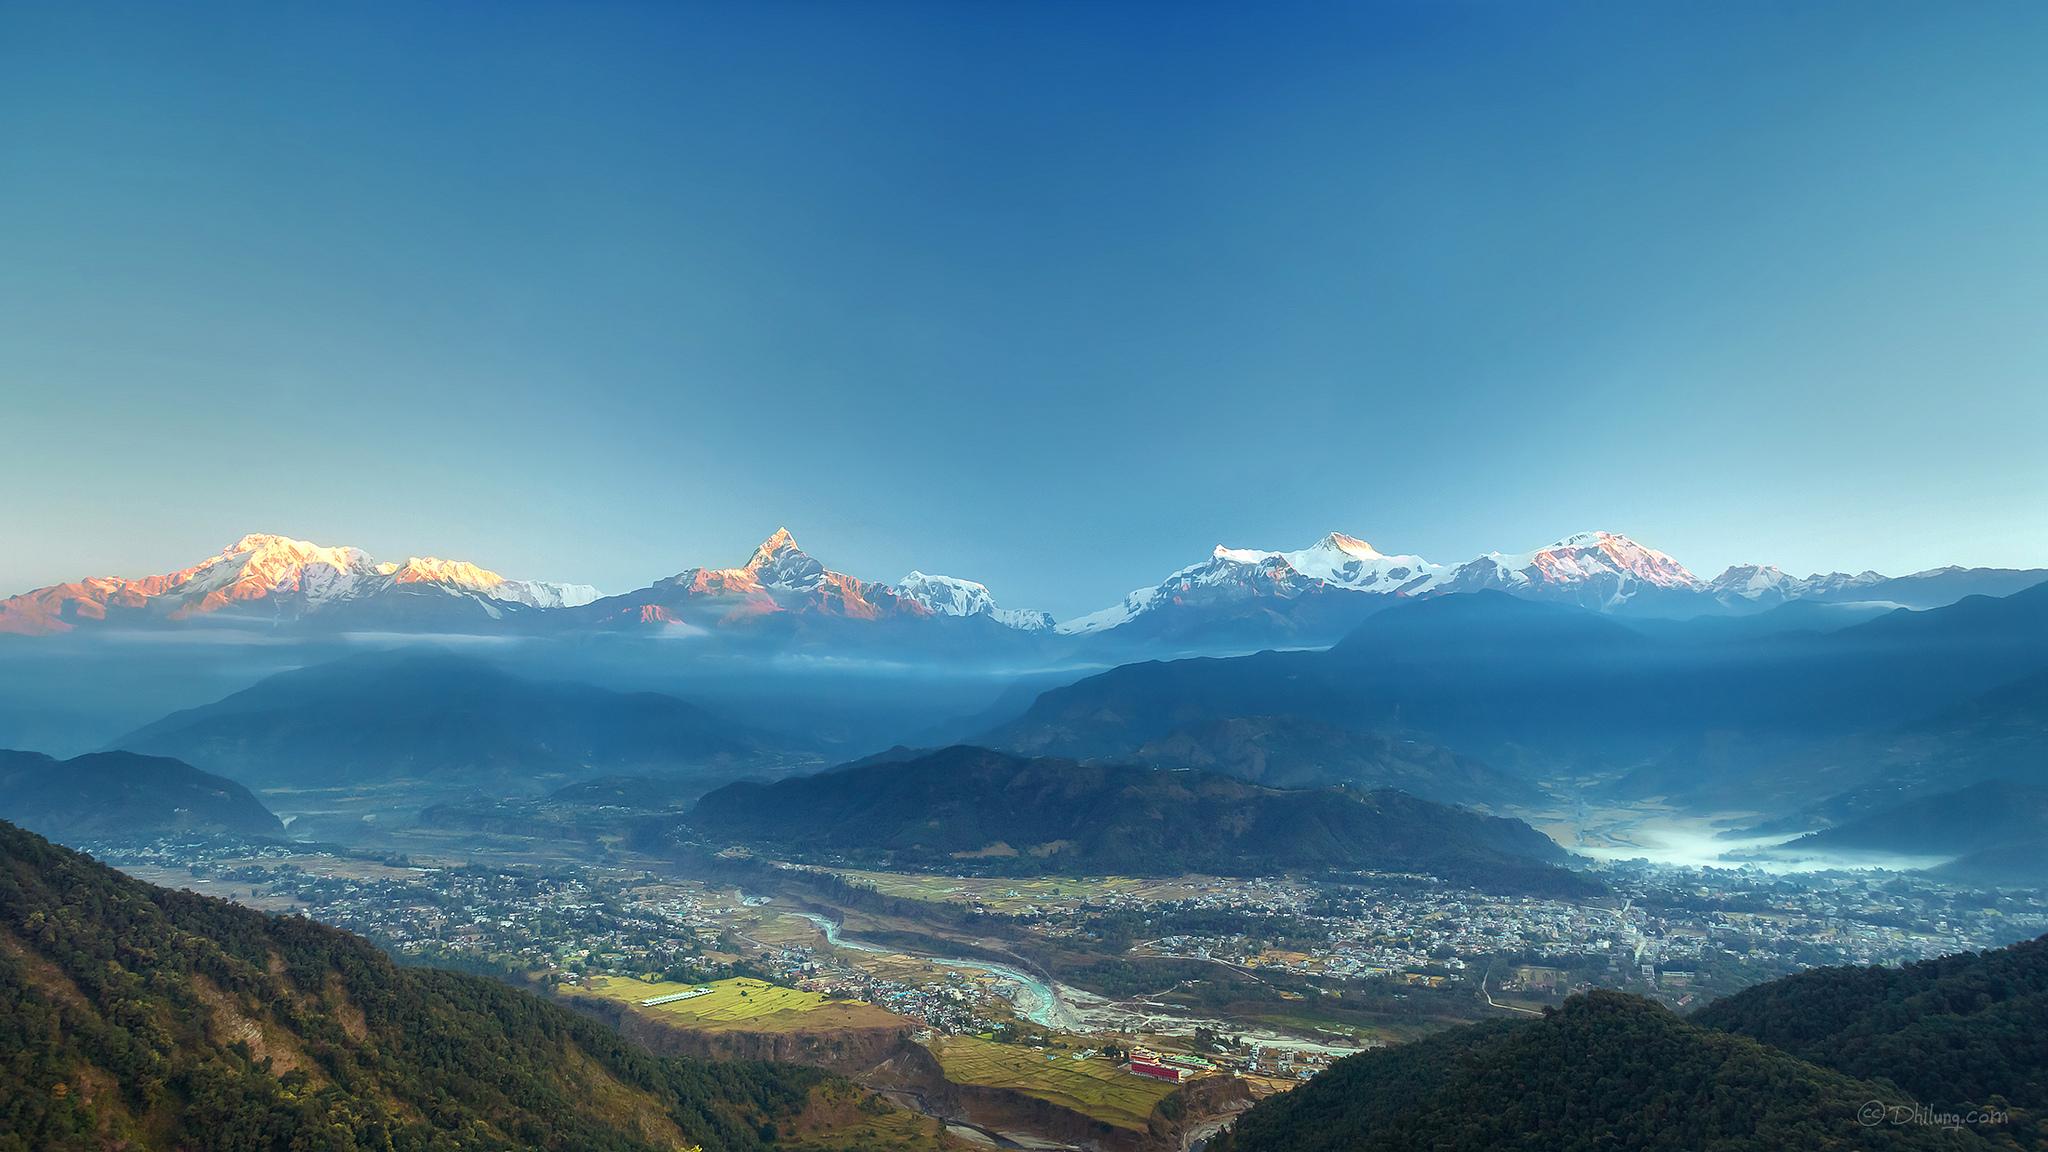 """Sarangkot Sunrise, Pokhara, Nepal"" by Dhilung Kirat"